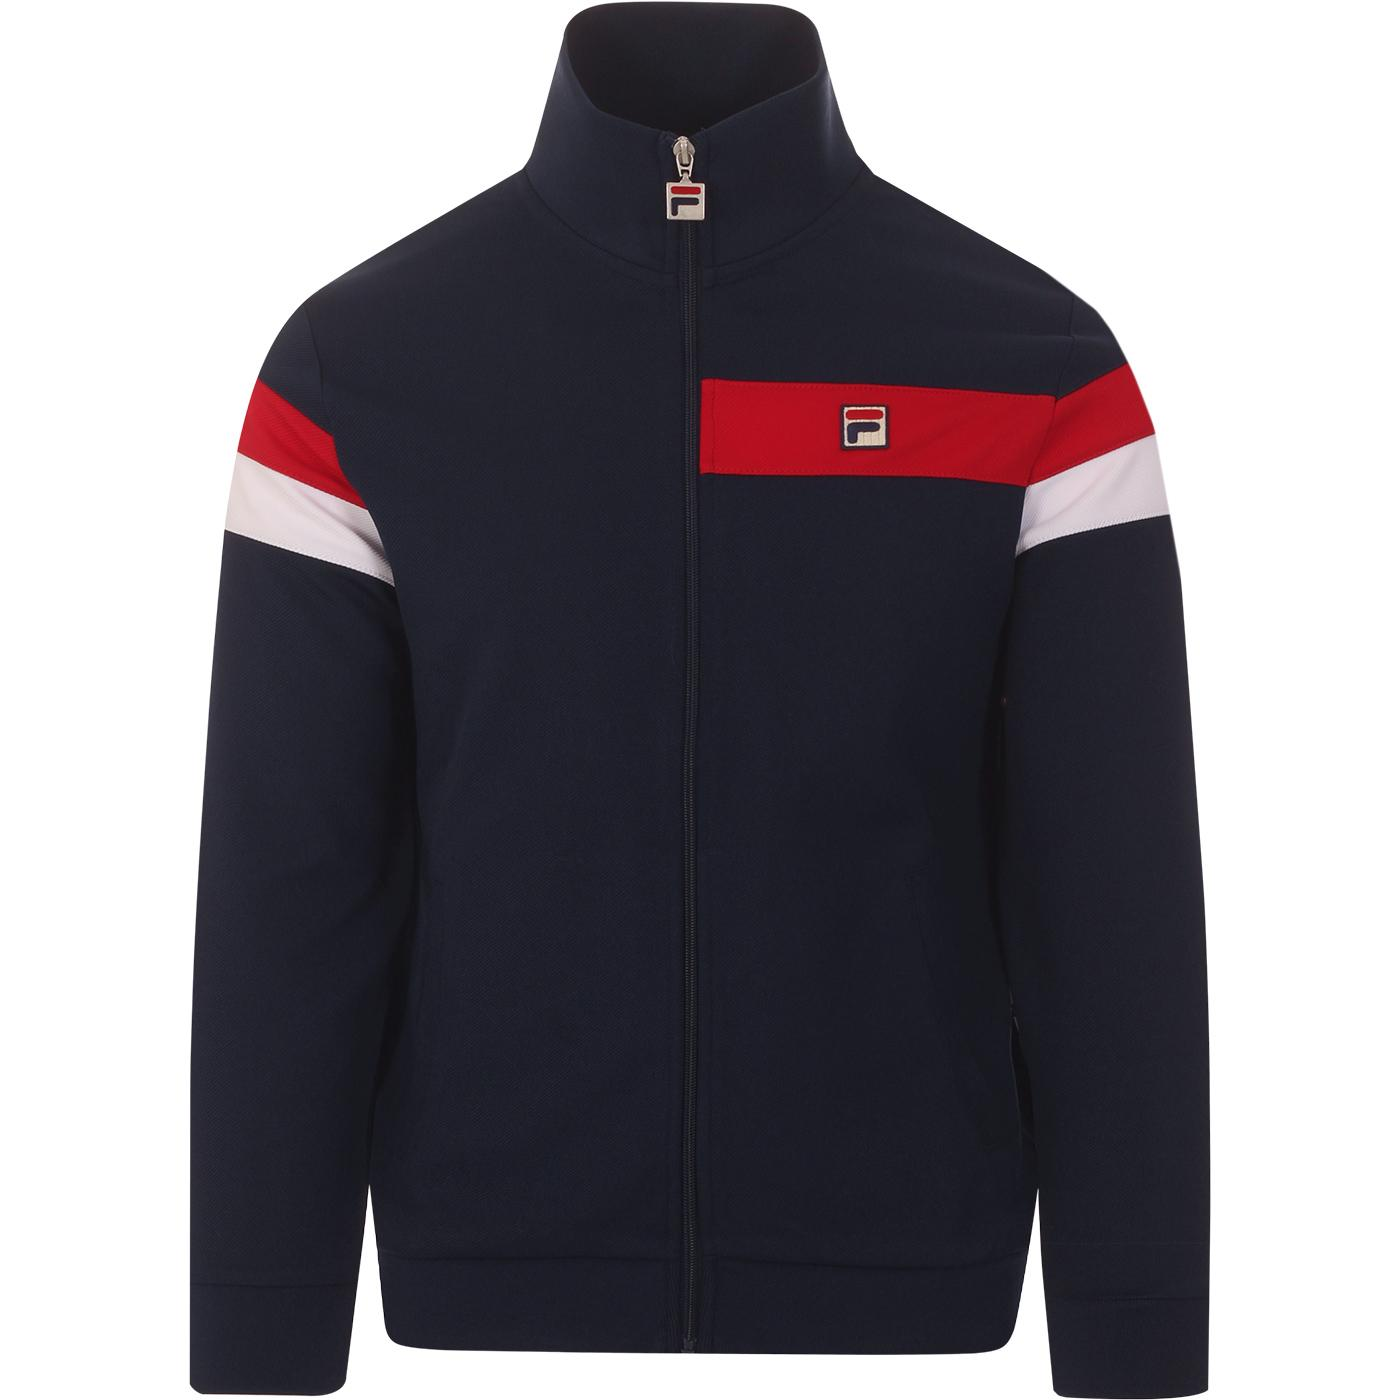 Malcolm FILA VINTAGE 80s Chest Stripe Track Jacket